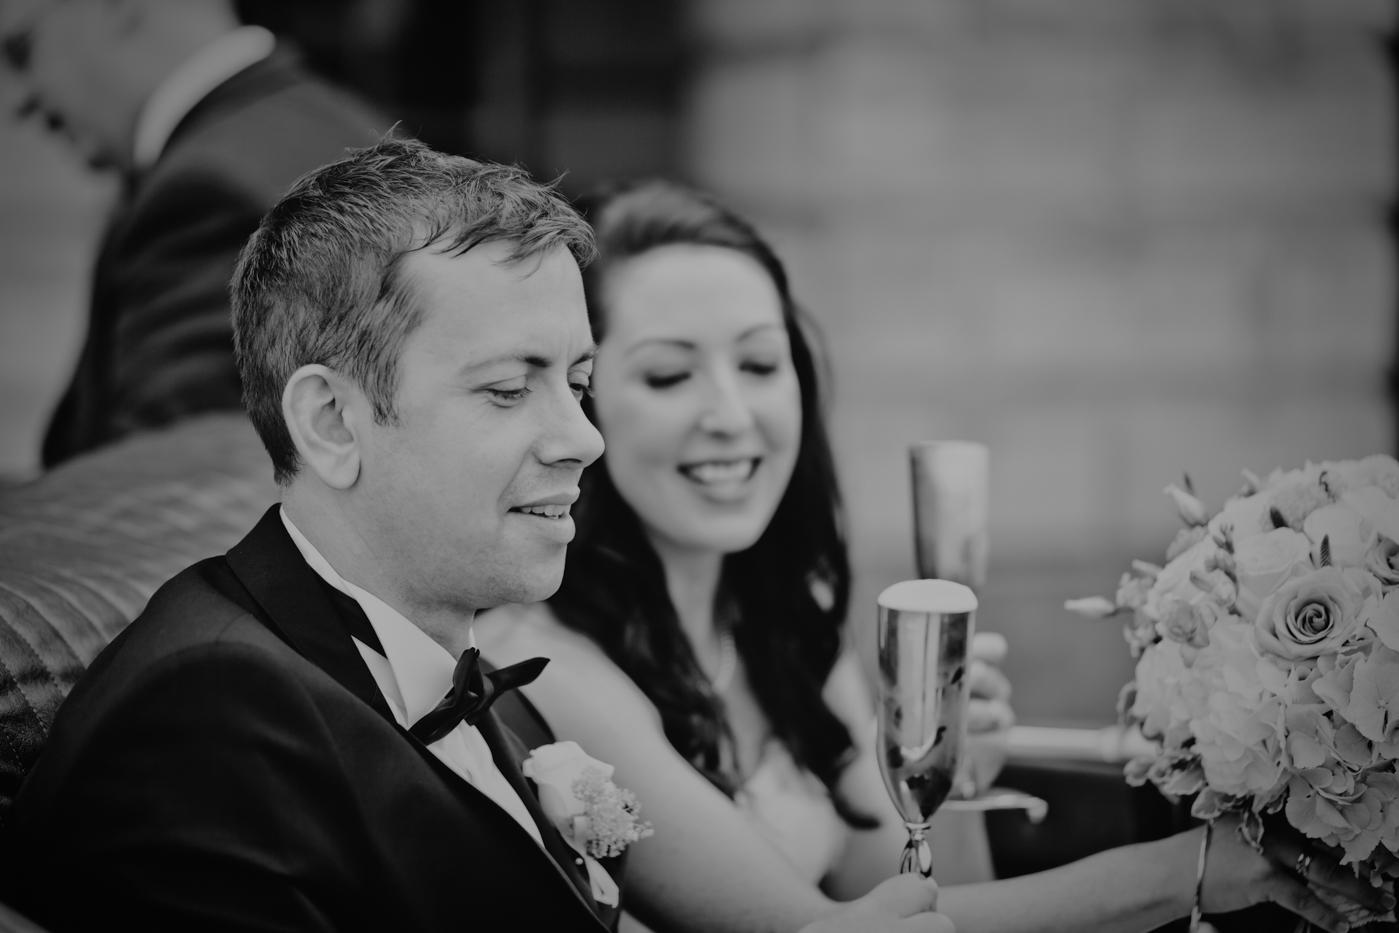 113 - Abi and Chris at Kedleston Hall - Wedding Photography by Mark Pugh www.markpugh.com - 0278.JPG